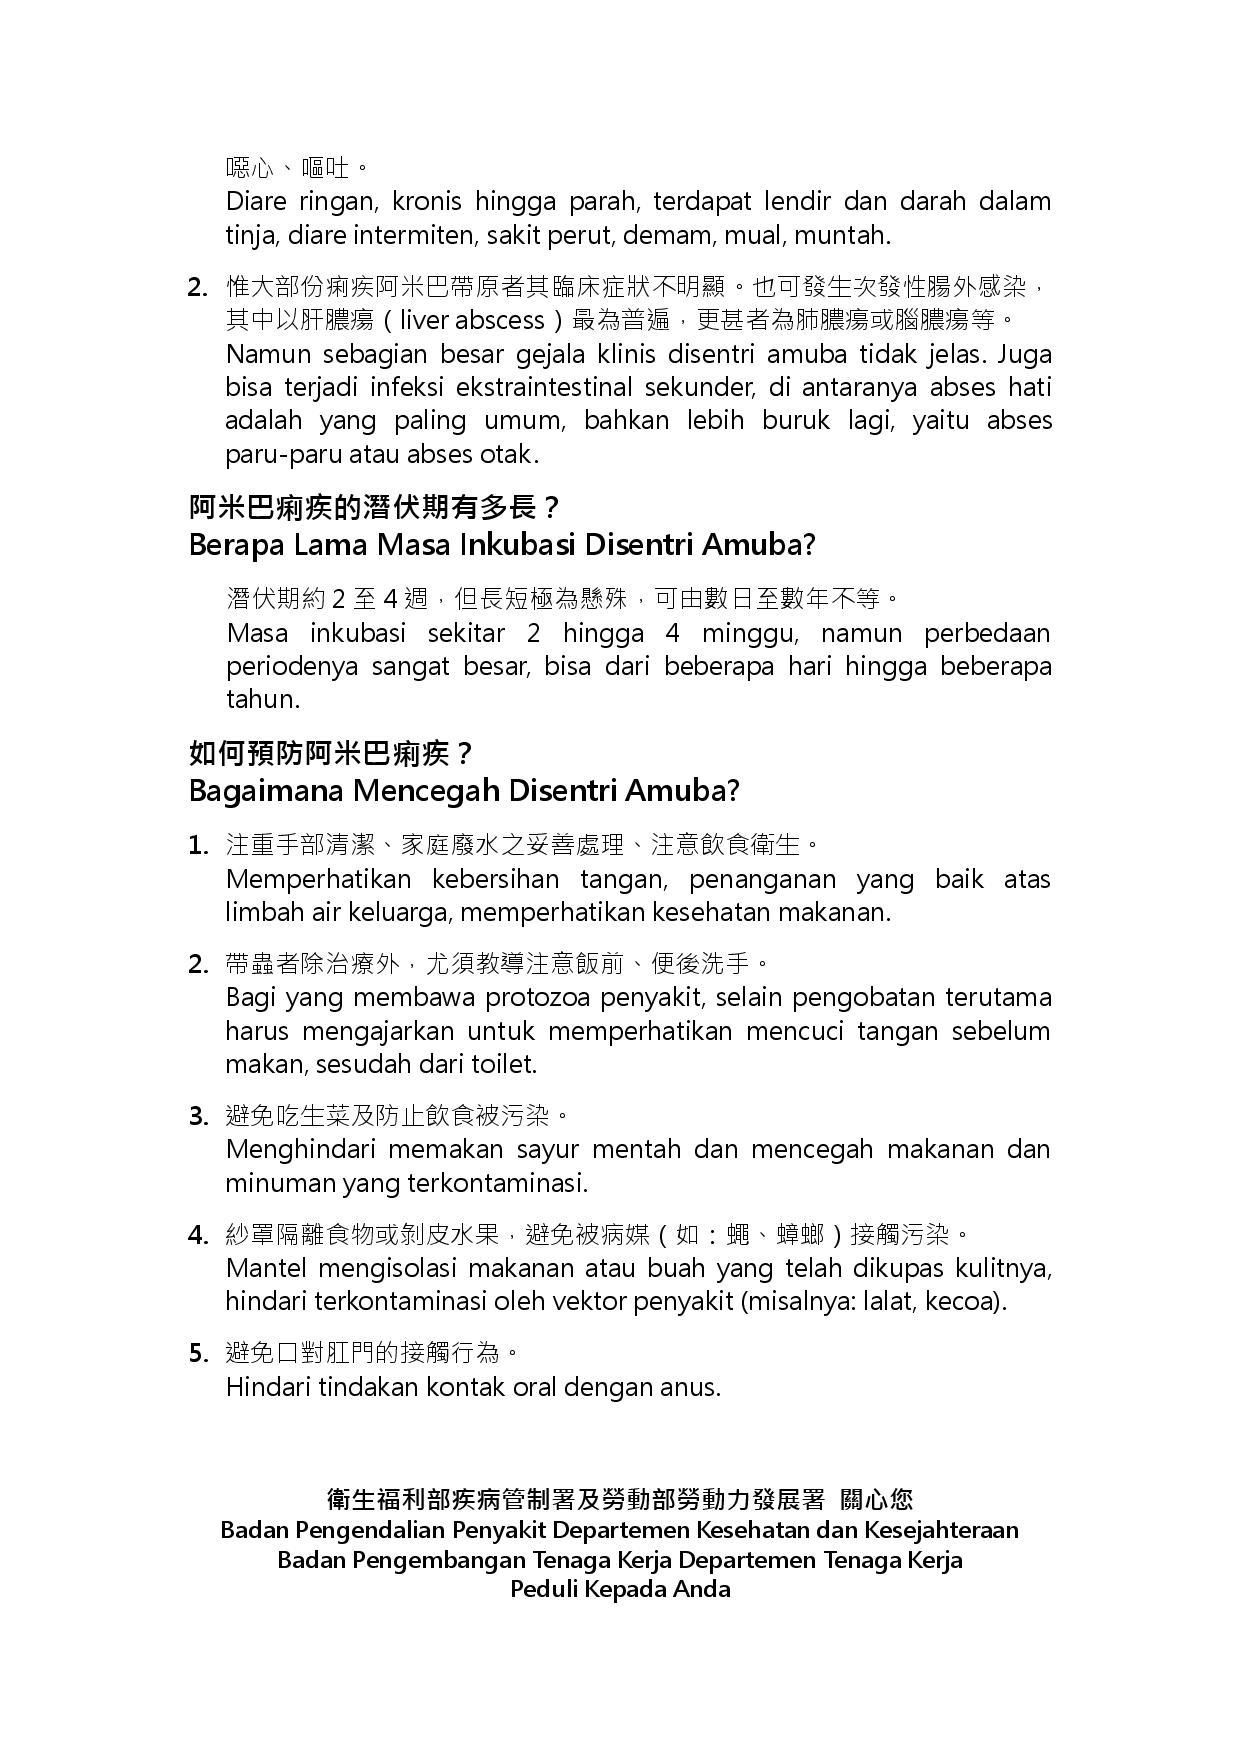 詳如附件【Klik】Mencegah Disentri Amuba(Halaman 2)預防阿米巴痢疾(印尼文)